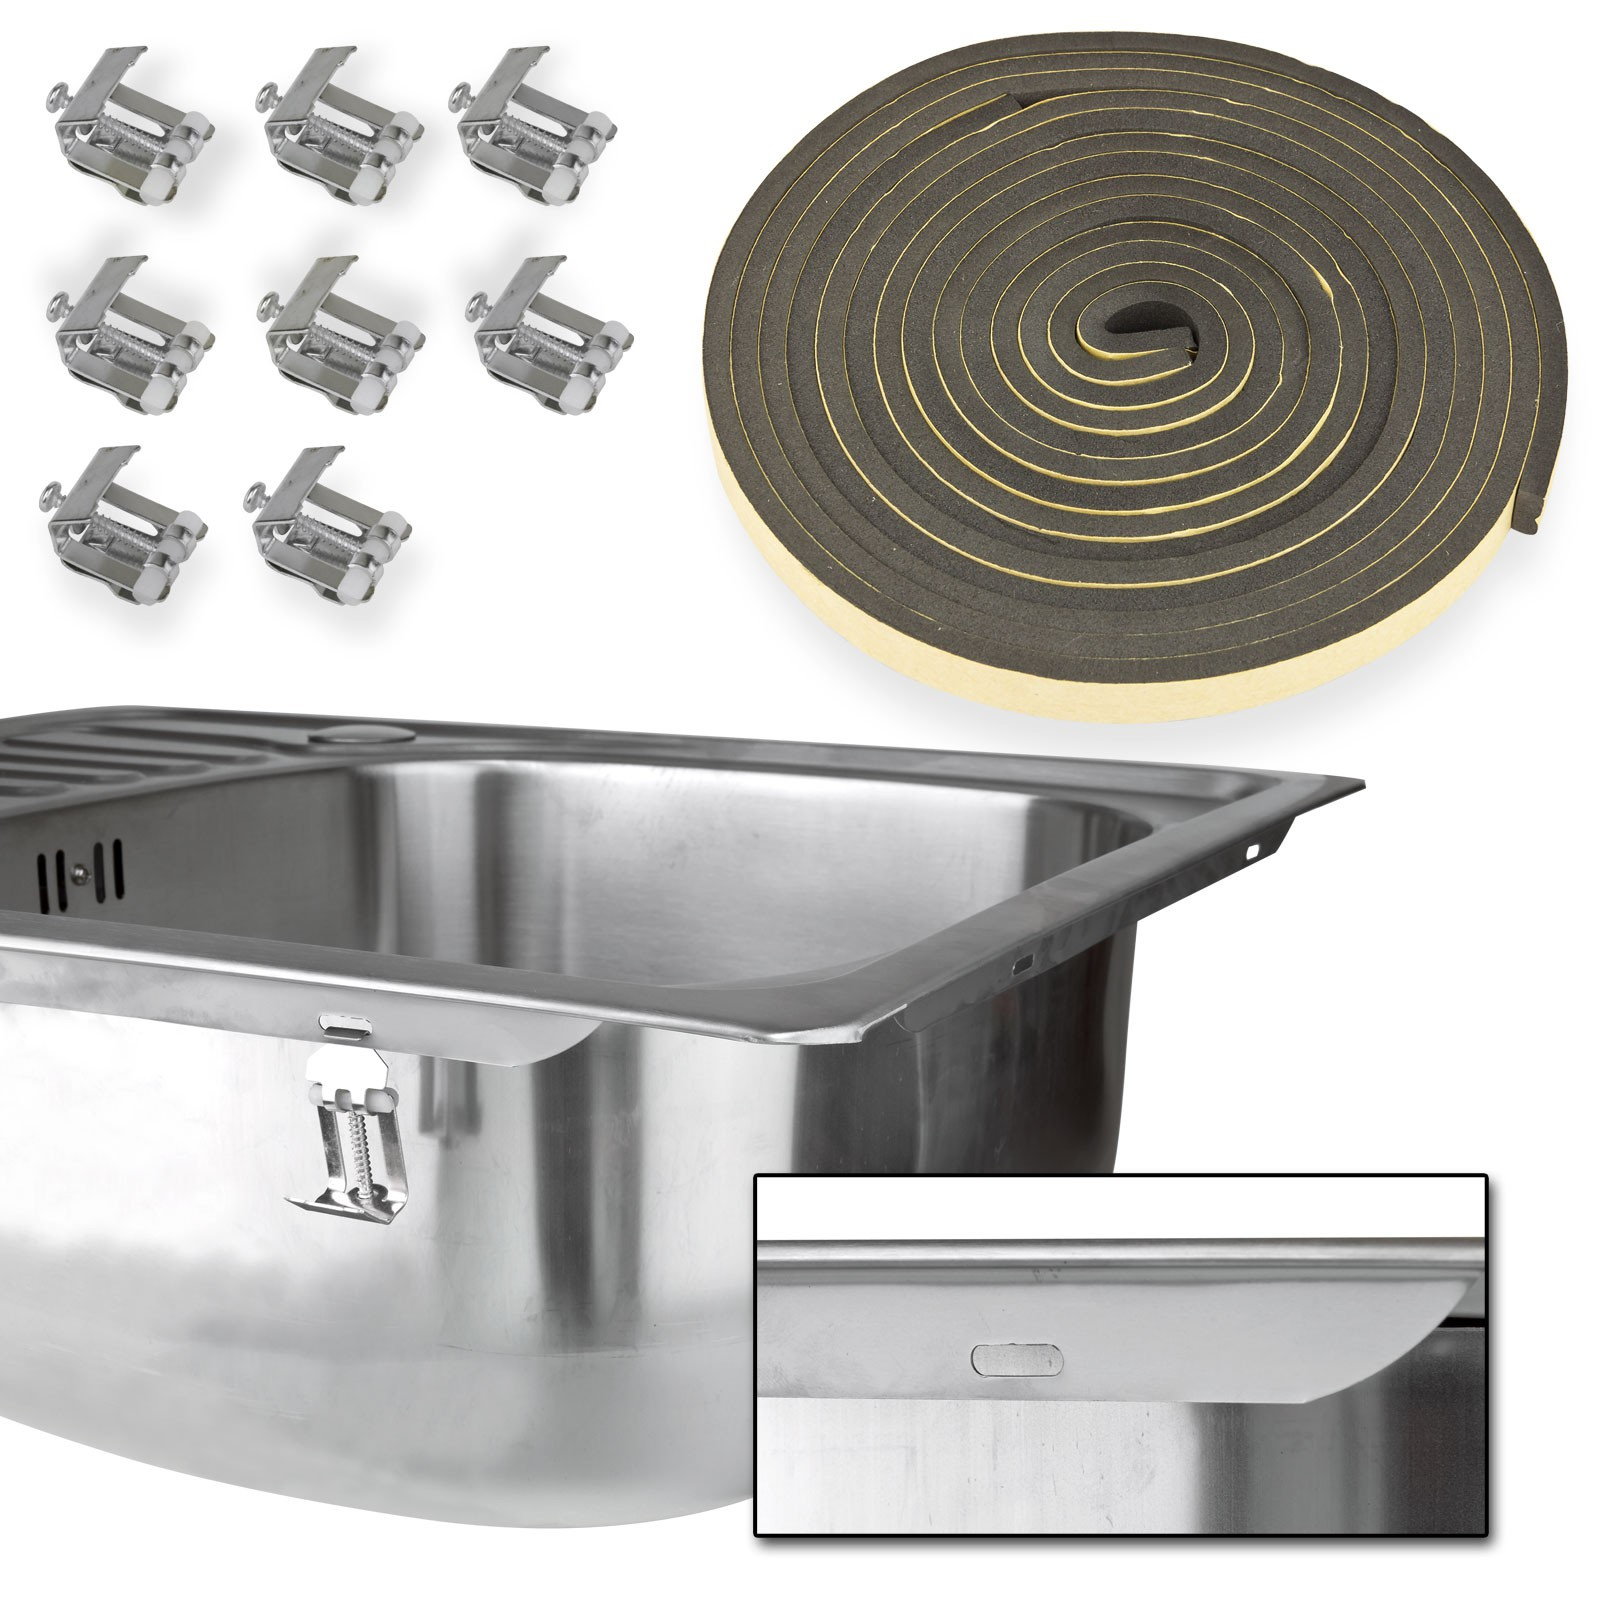 edelstahl waschbecken sp le rechts einbau sp le sp lbecken k chensp le recht eck ebay. Black Bedroom Furniture Sets. Home Design Ideas